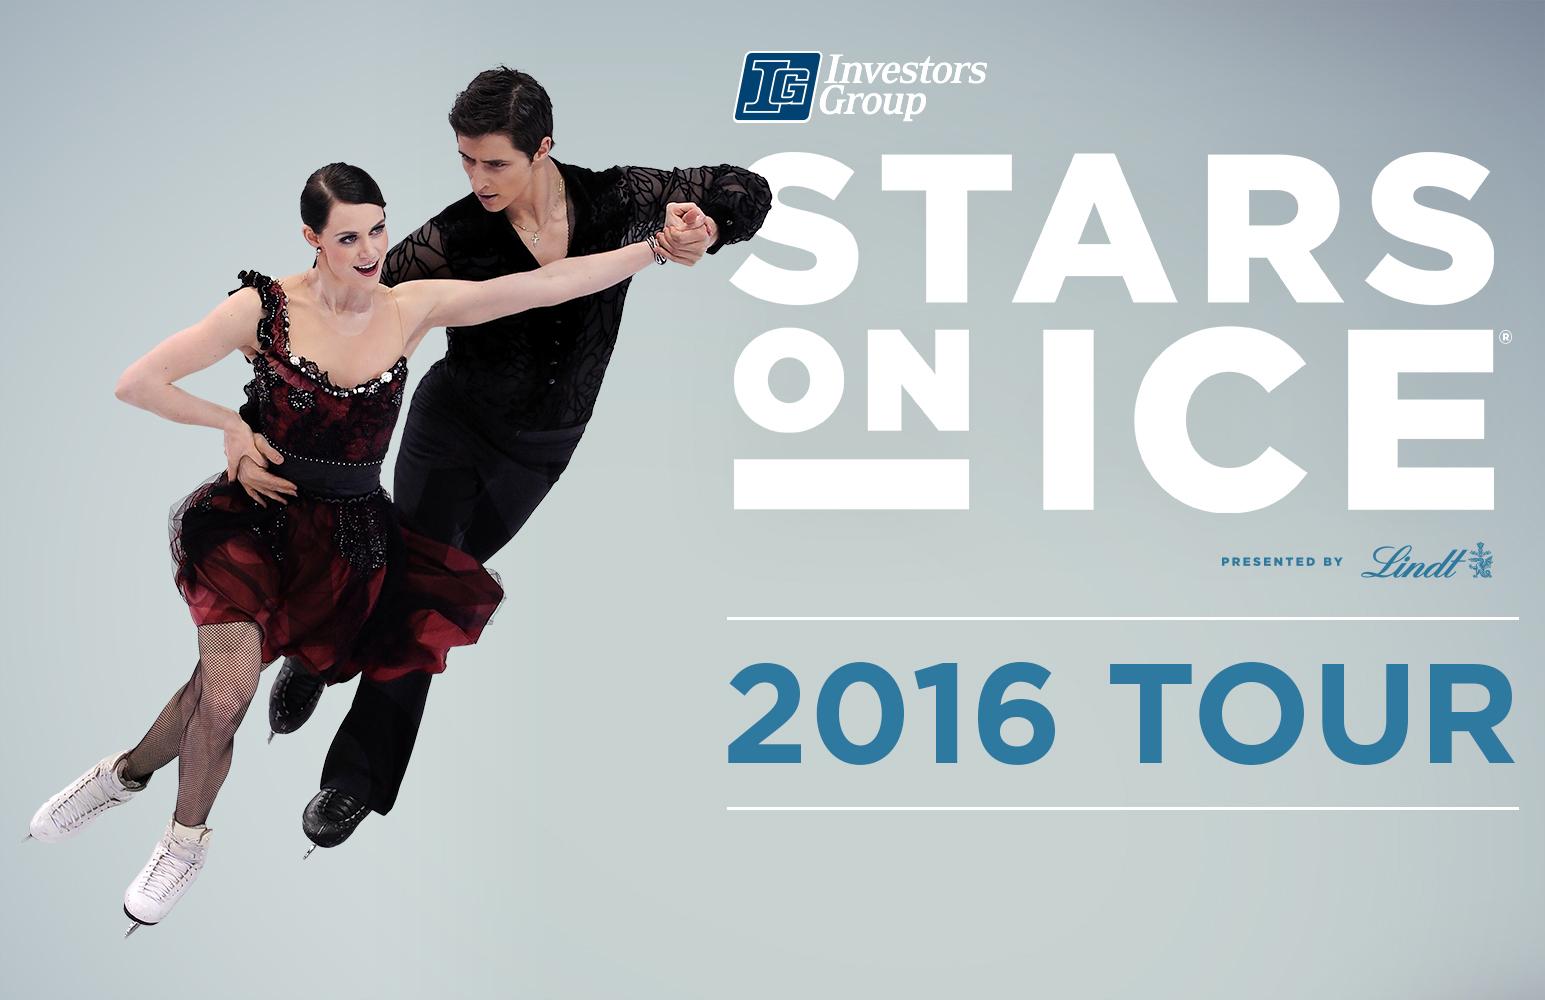 Stars on Ice Horizontal Keyart - 2016